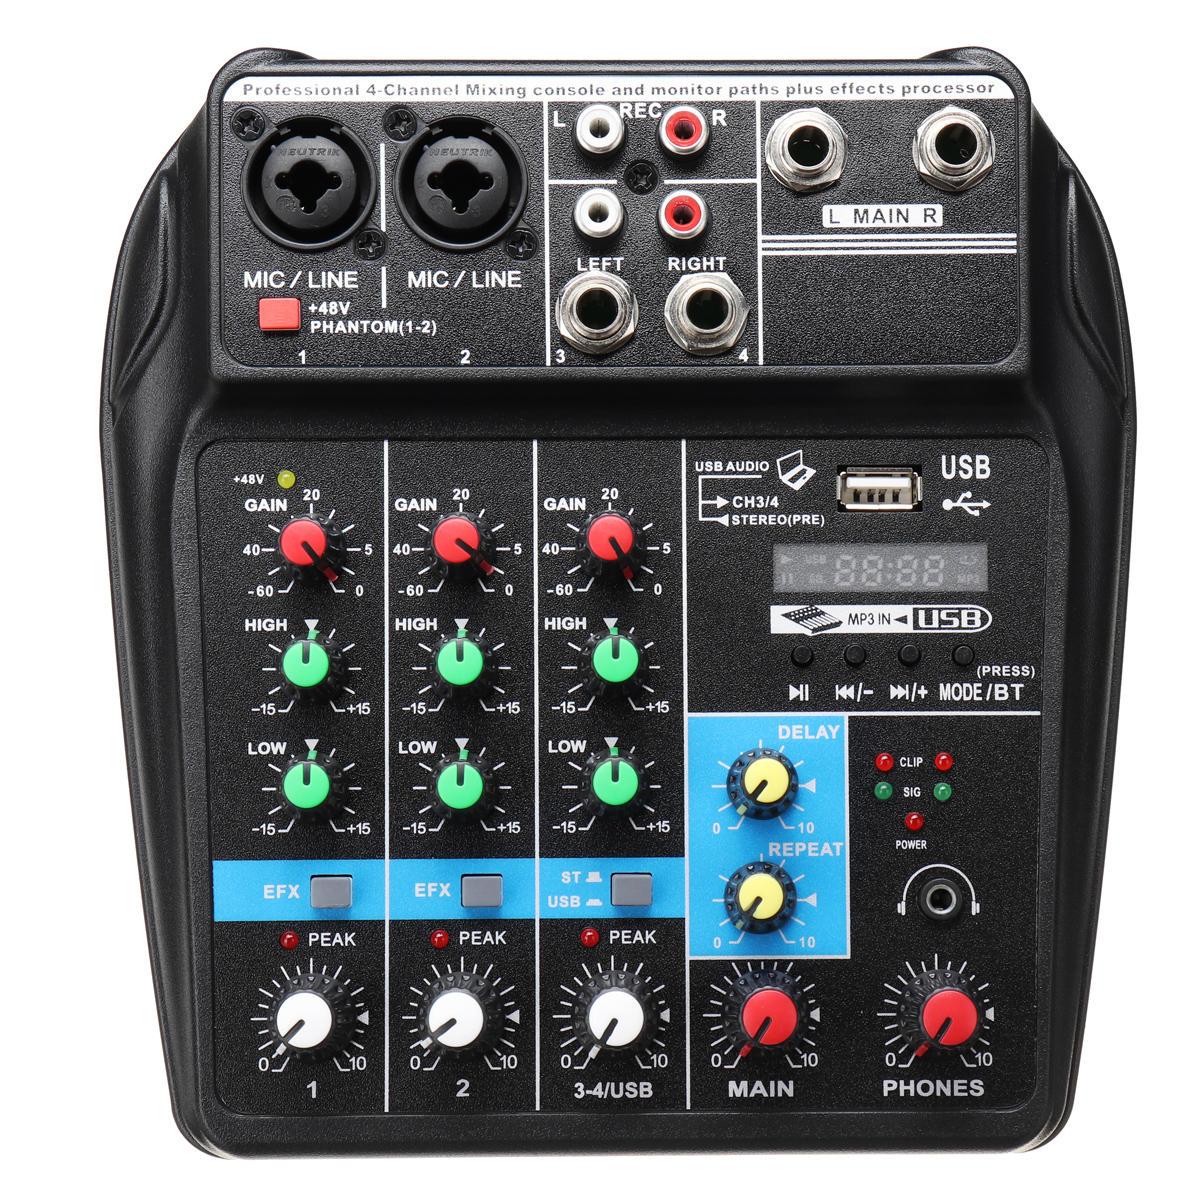 4 Channels USB Portable Mixer bluetooth Record Live Studio DJ Audio Mixing  Console